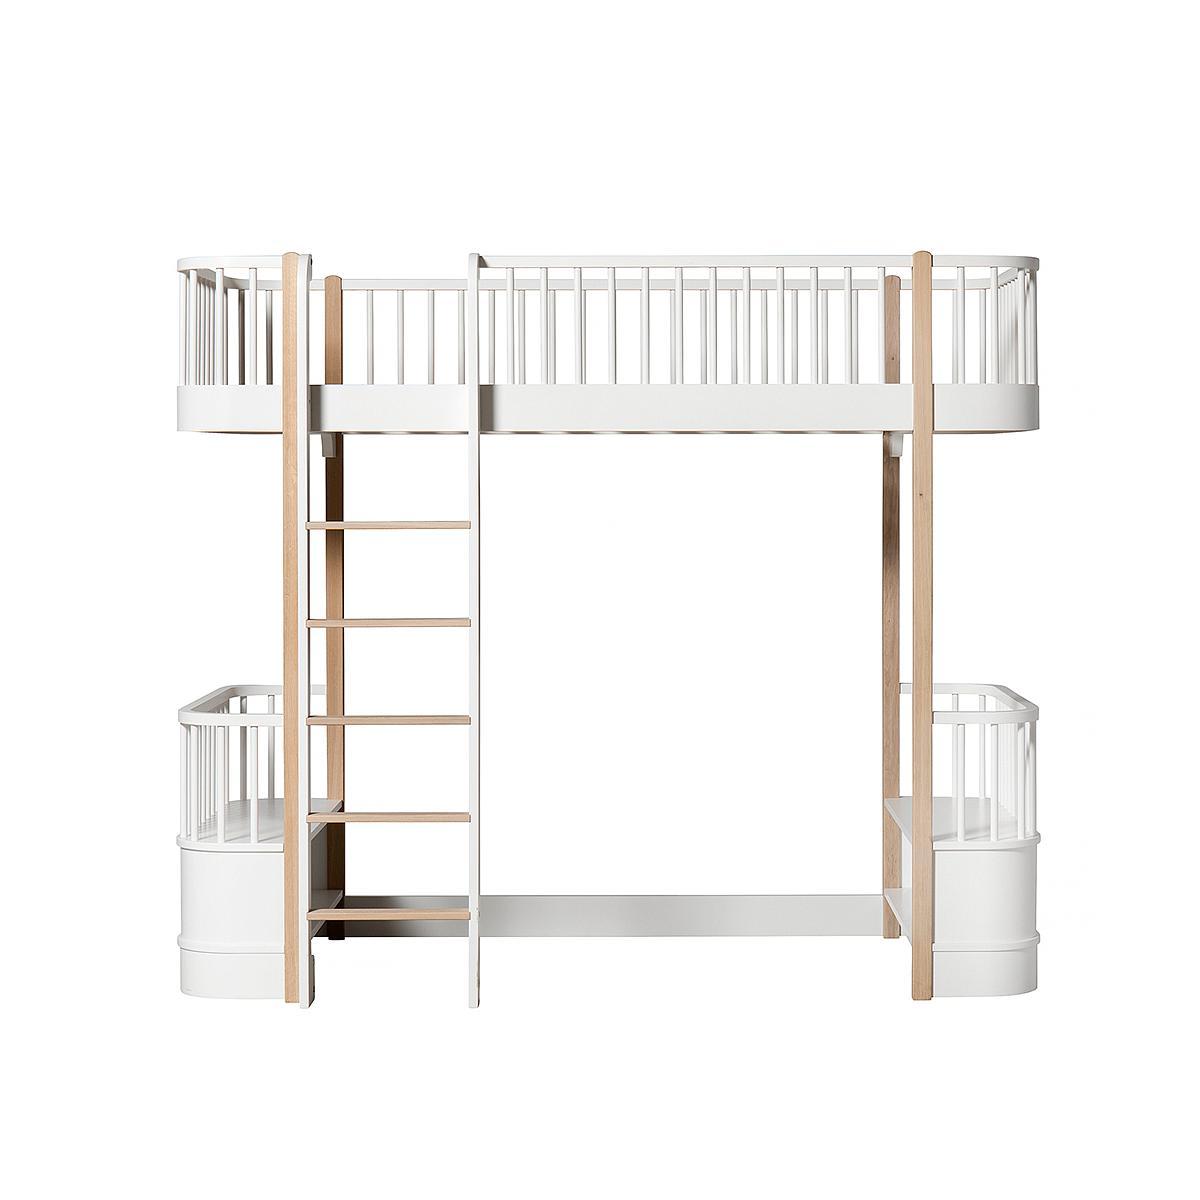 Cama evolutiva alta 90x200cm WOOD ORIGINAL Oliver Furniture blanco-roble